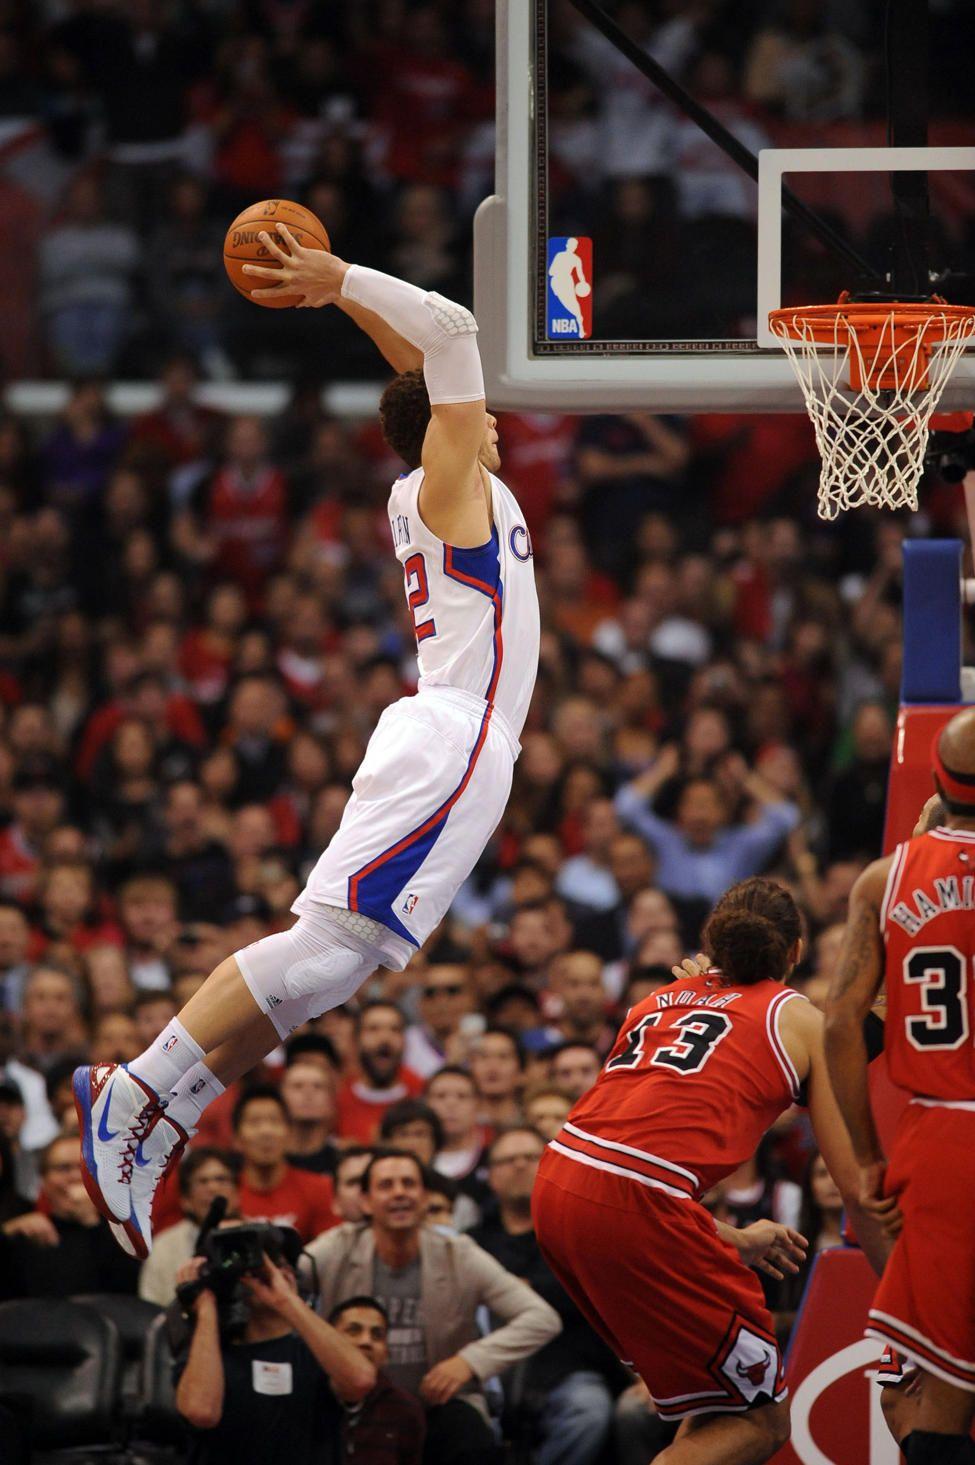 Blake Griffin S Best Dunk Photos Blake Griffin Sports Basketball Basketball